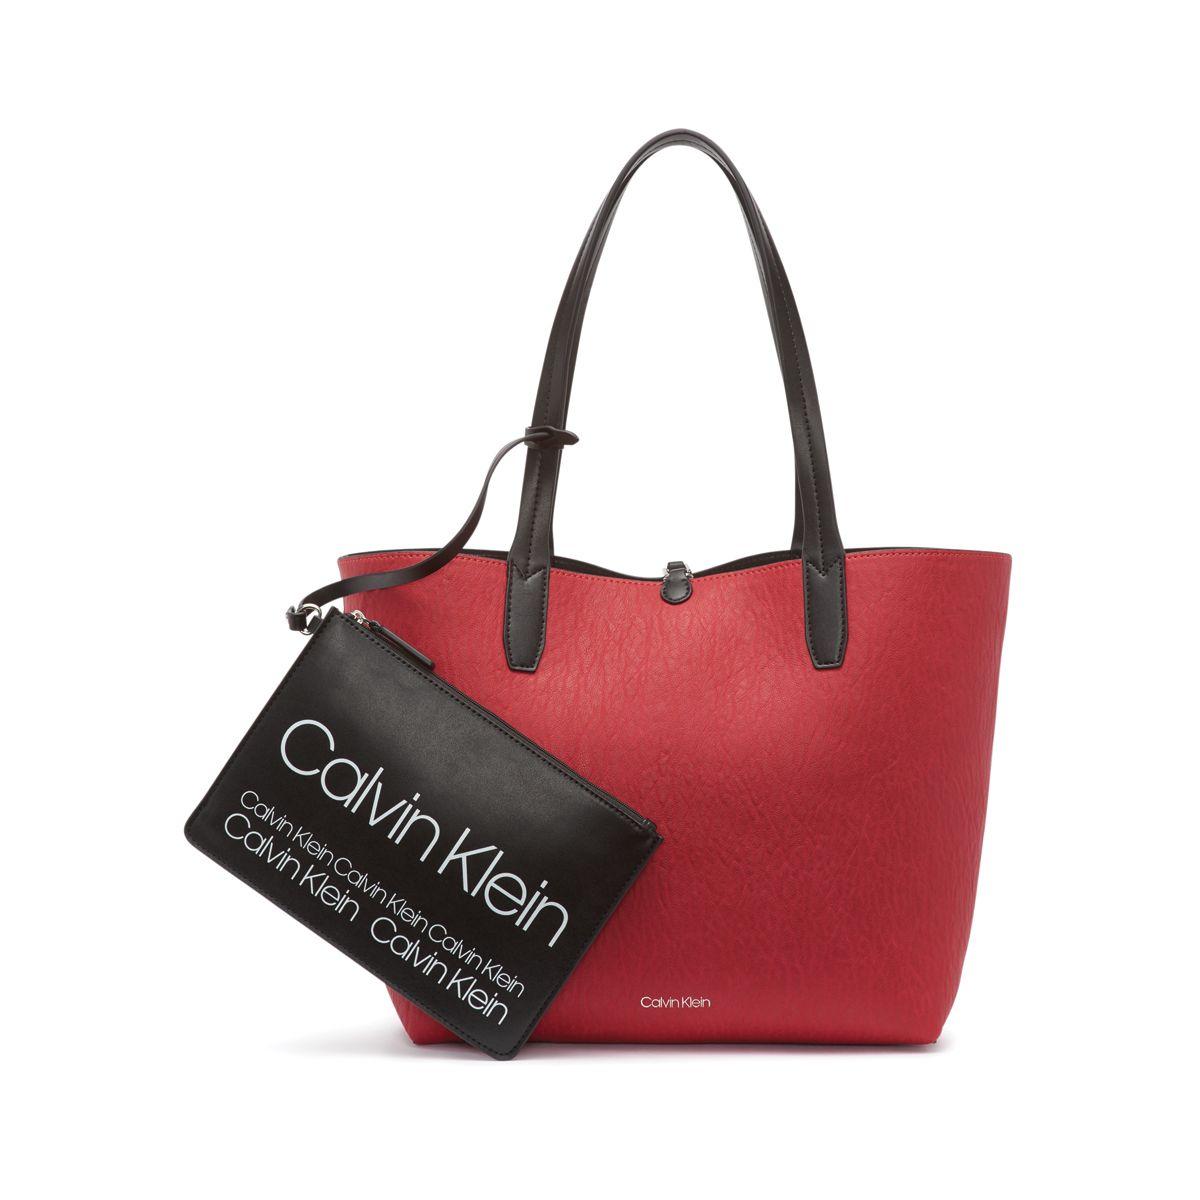 90eeb548d7 Calvin Klein Handbags   Bags - Macy s